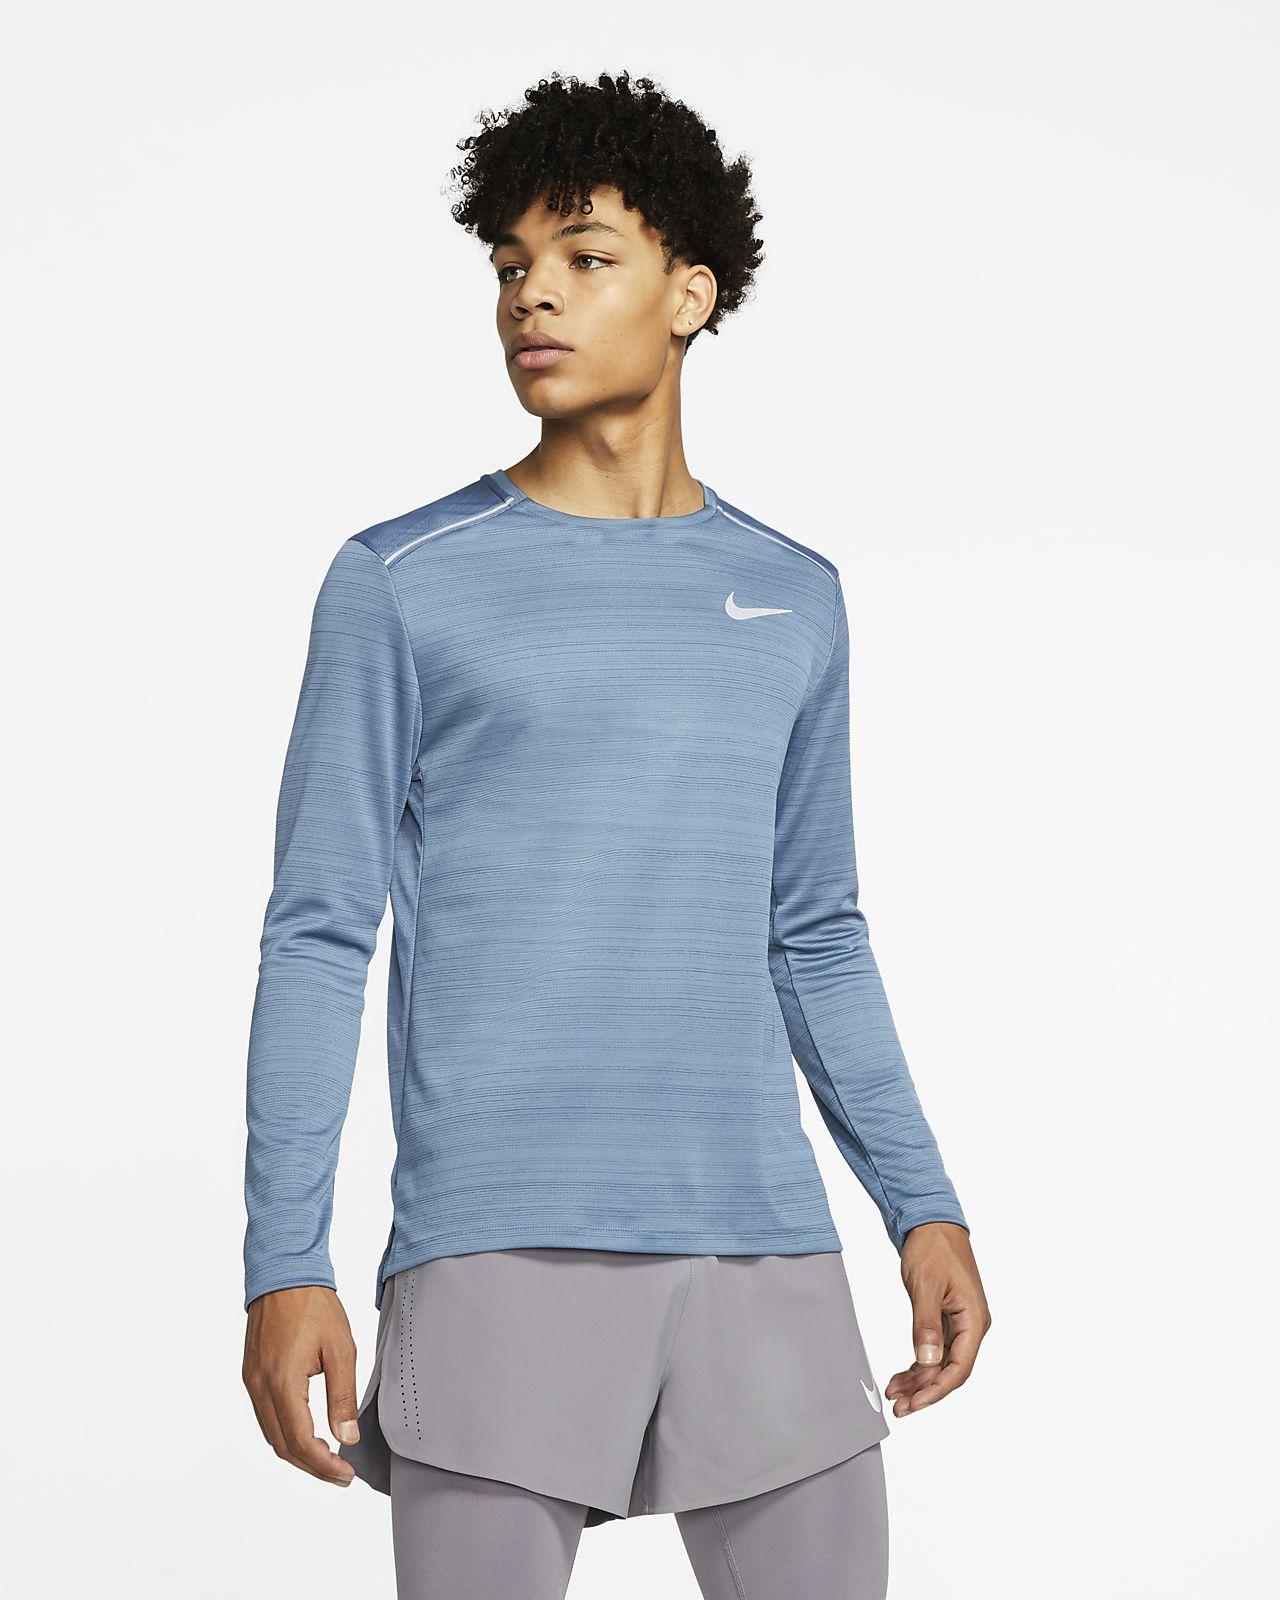 Nike Dri FIT Miler Camiseta de running de manga larga Hombre